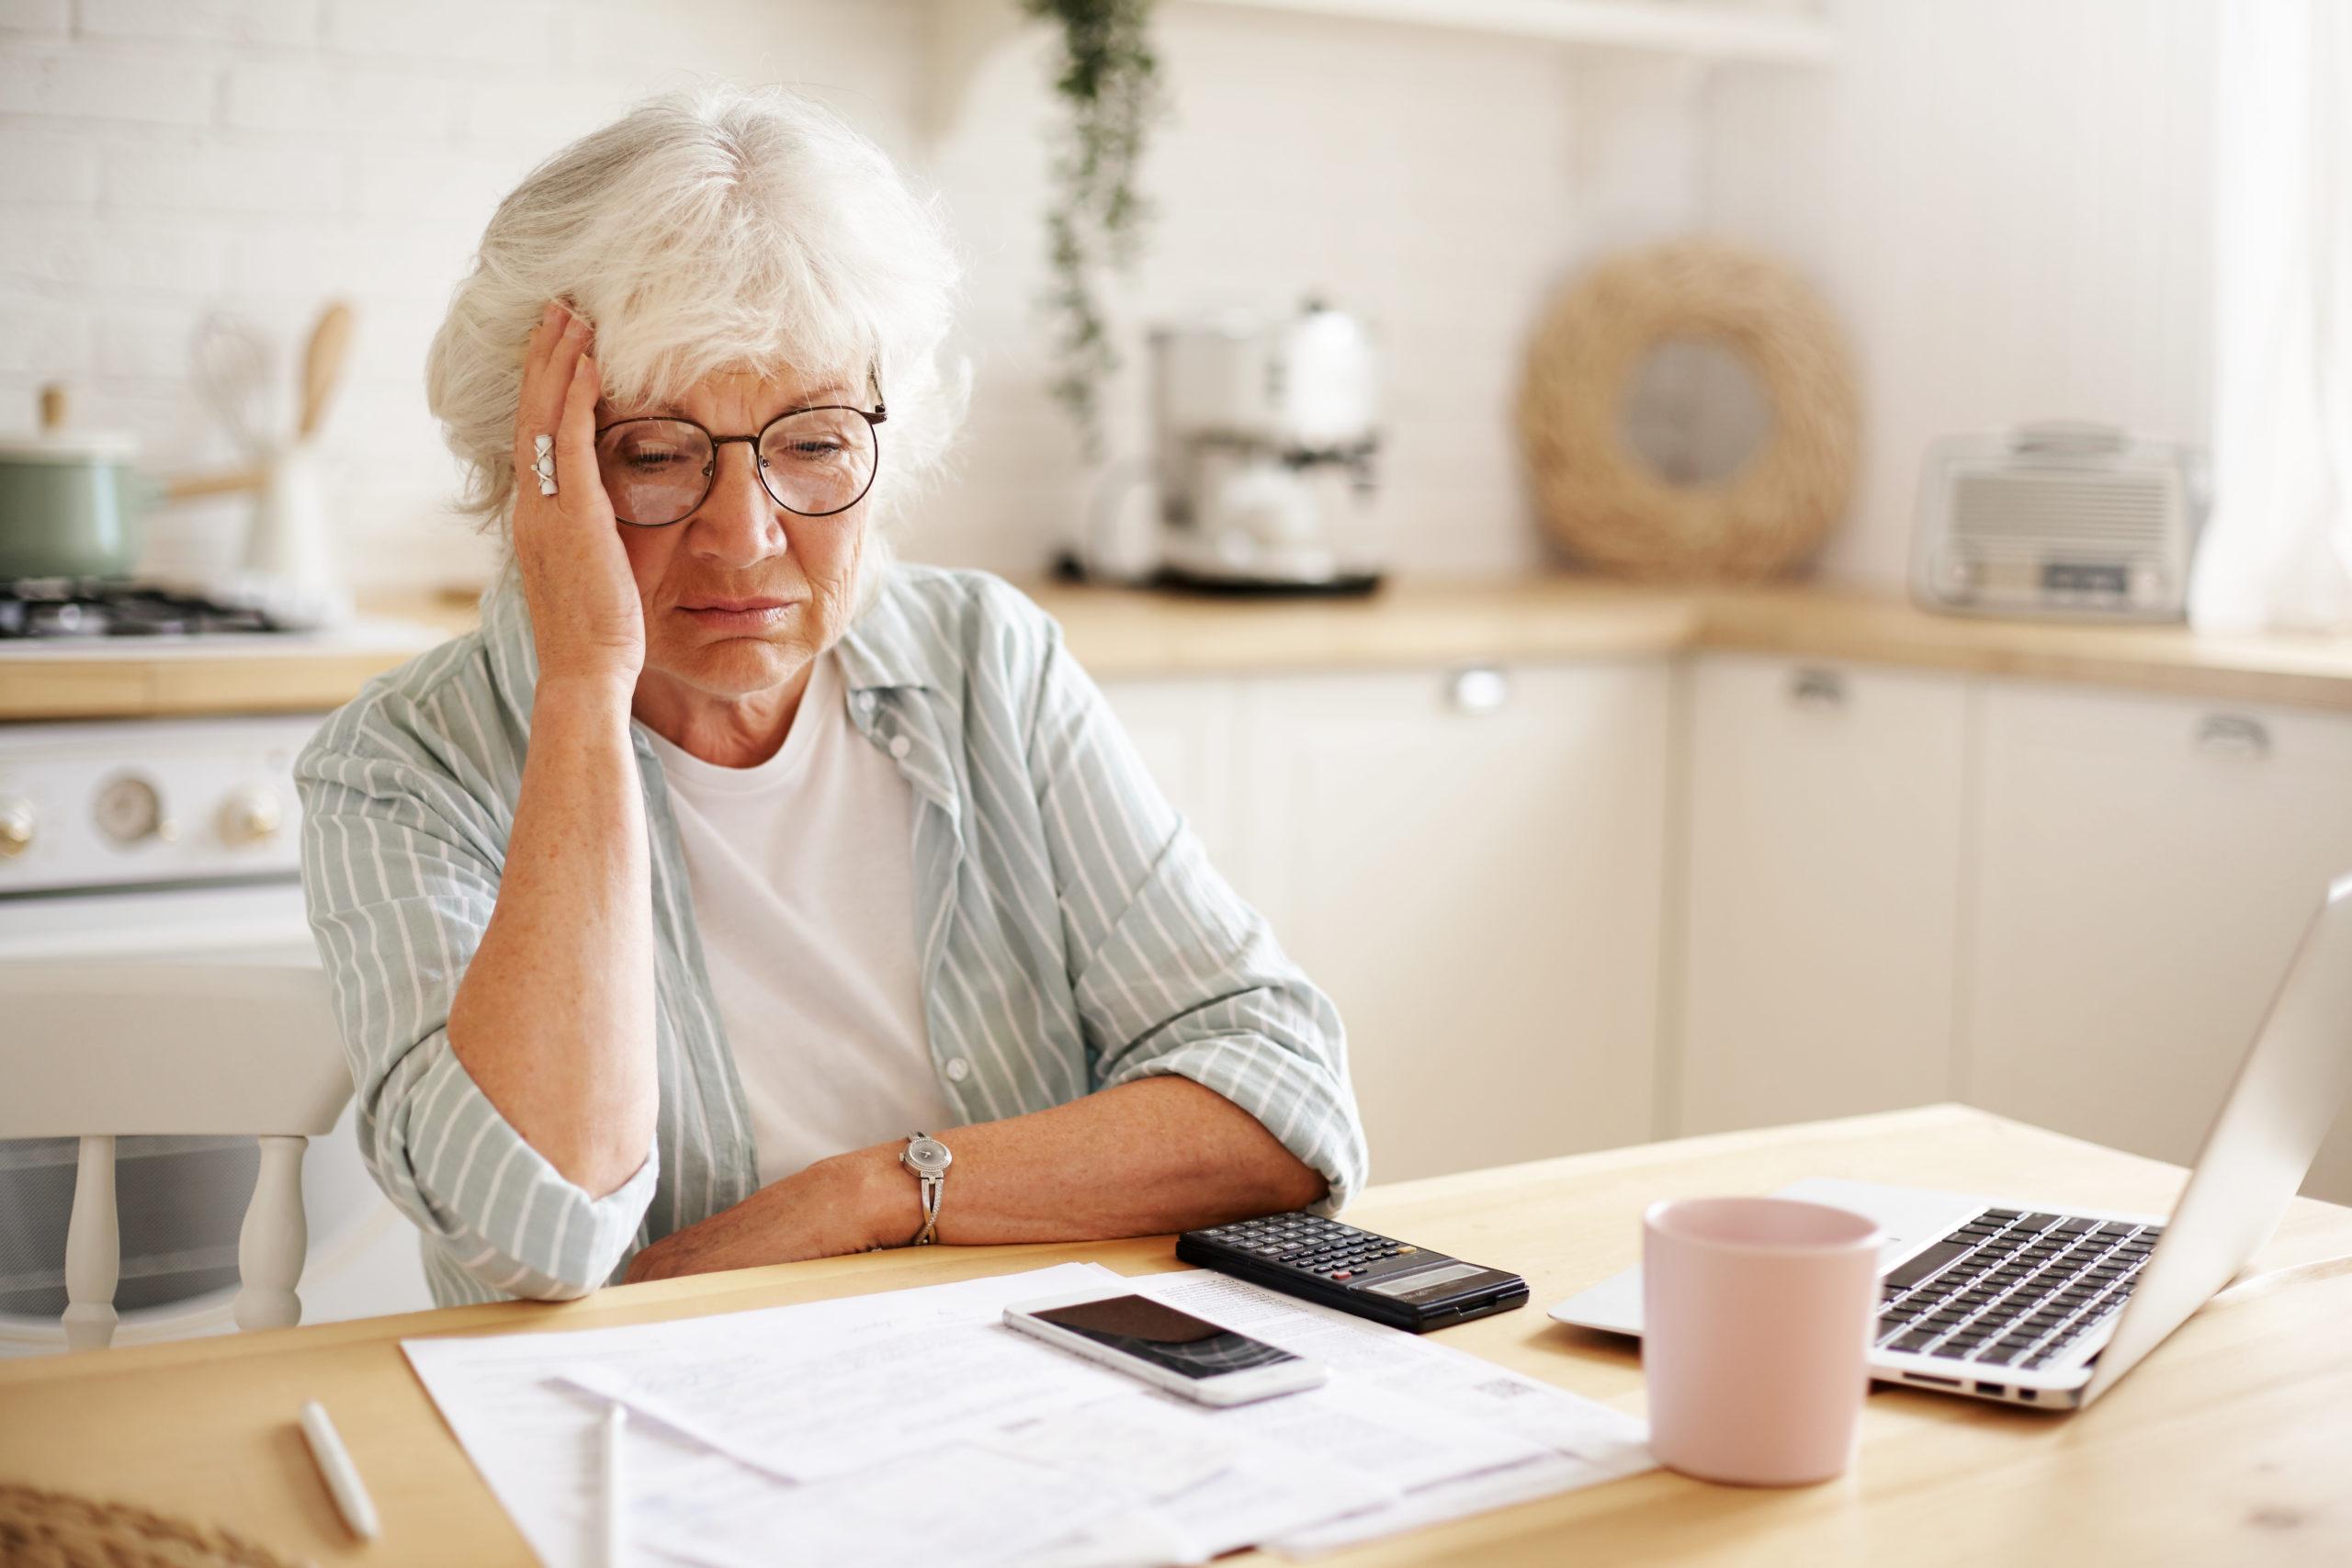 KATA nyugdíj kalkulátor